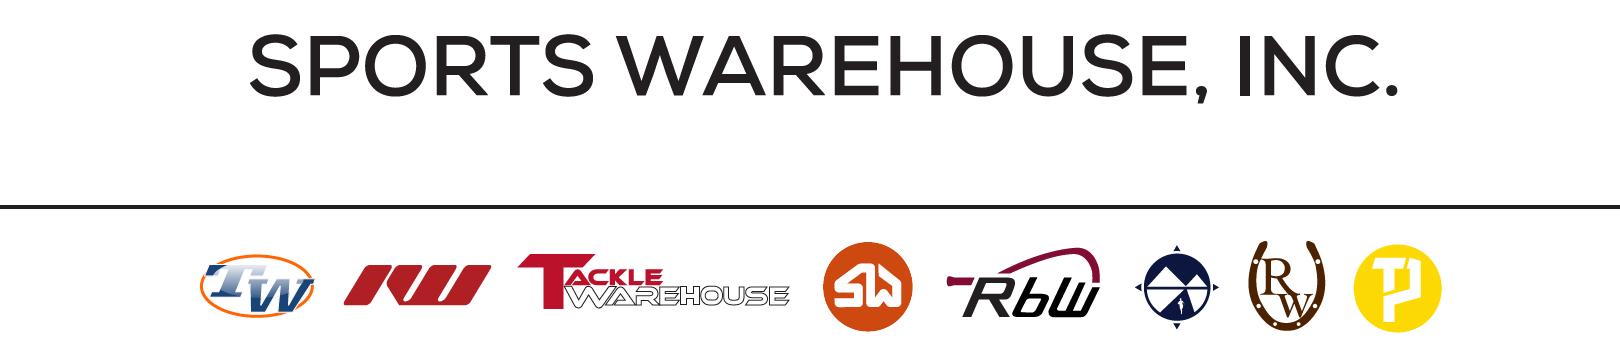 Tennis Warehouse Georgia Warehouse Associate Job Opening In Alpharetta Ga At Sports Warehouse Inc Salary Com